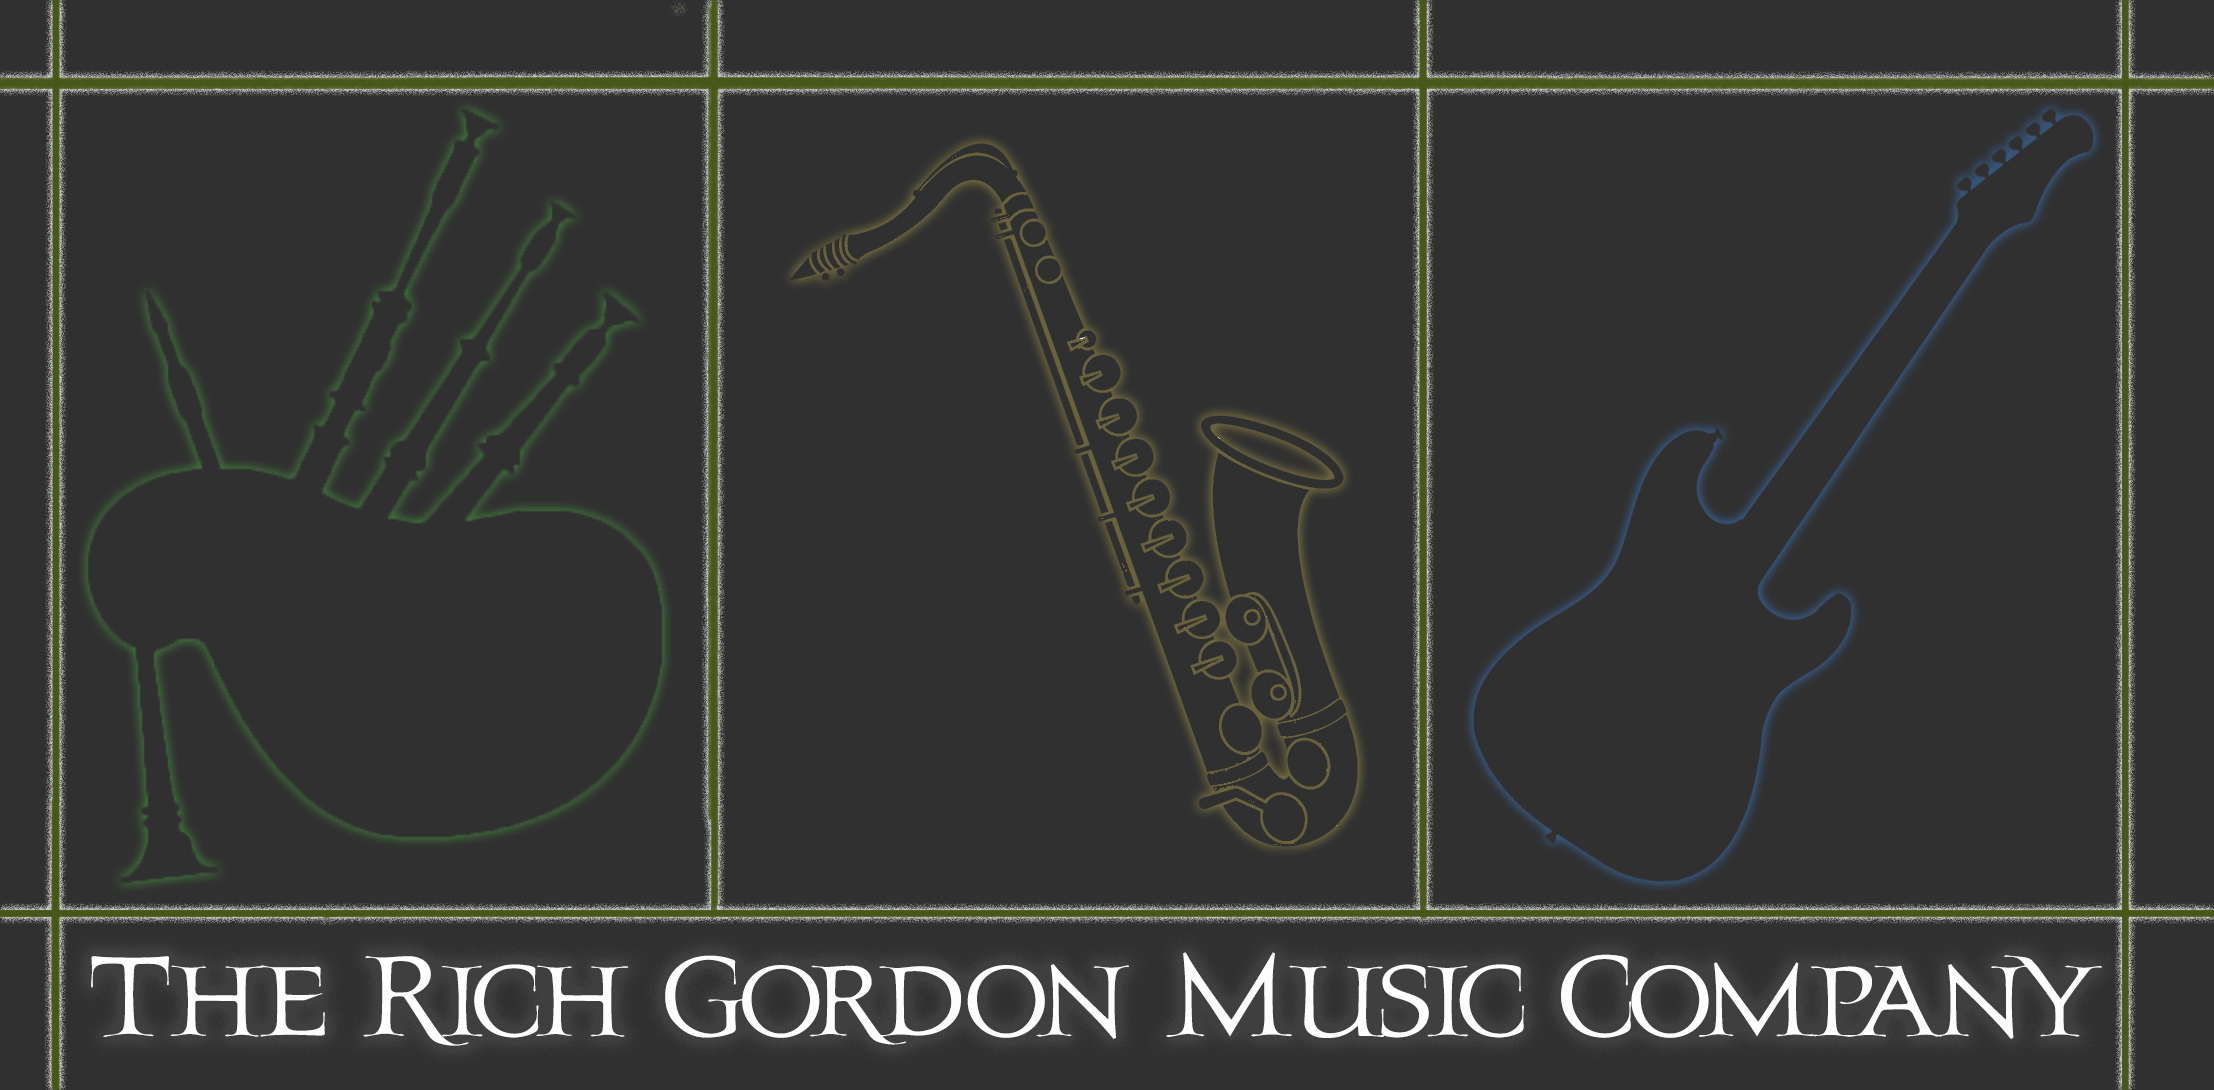 The Rich Gordon Music Company